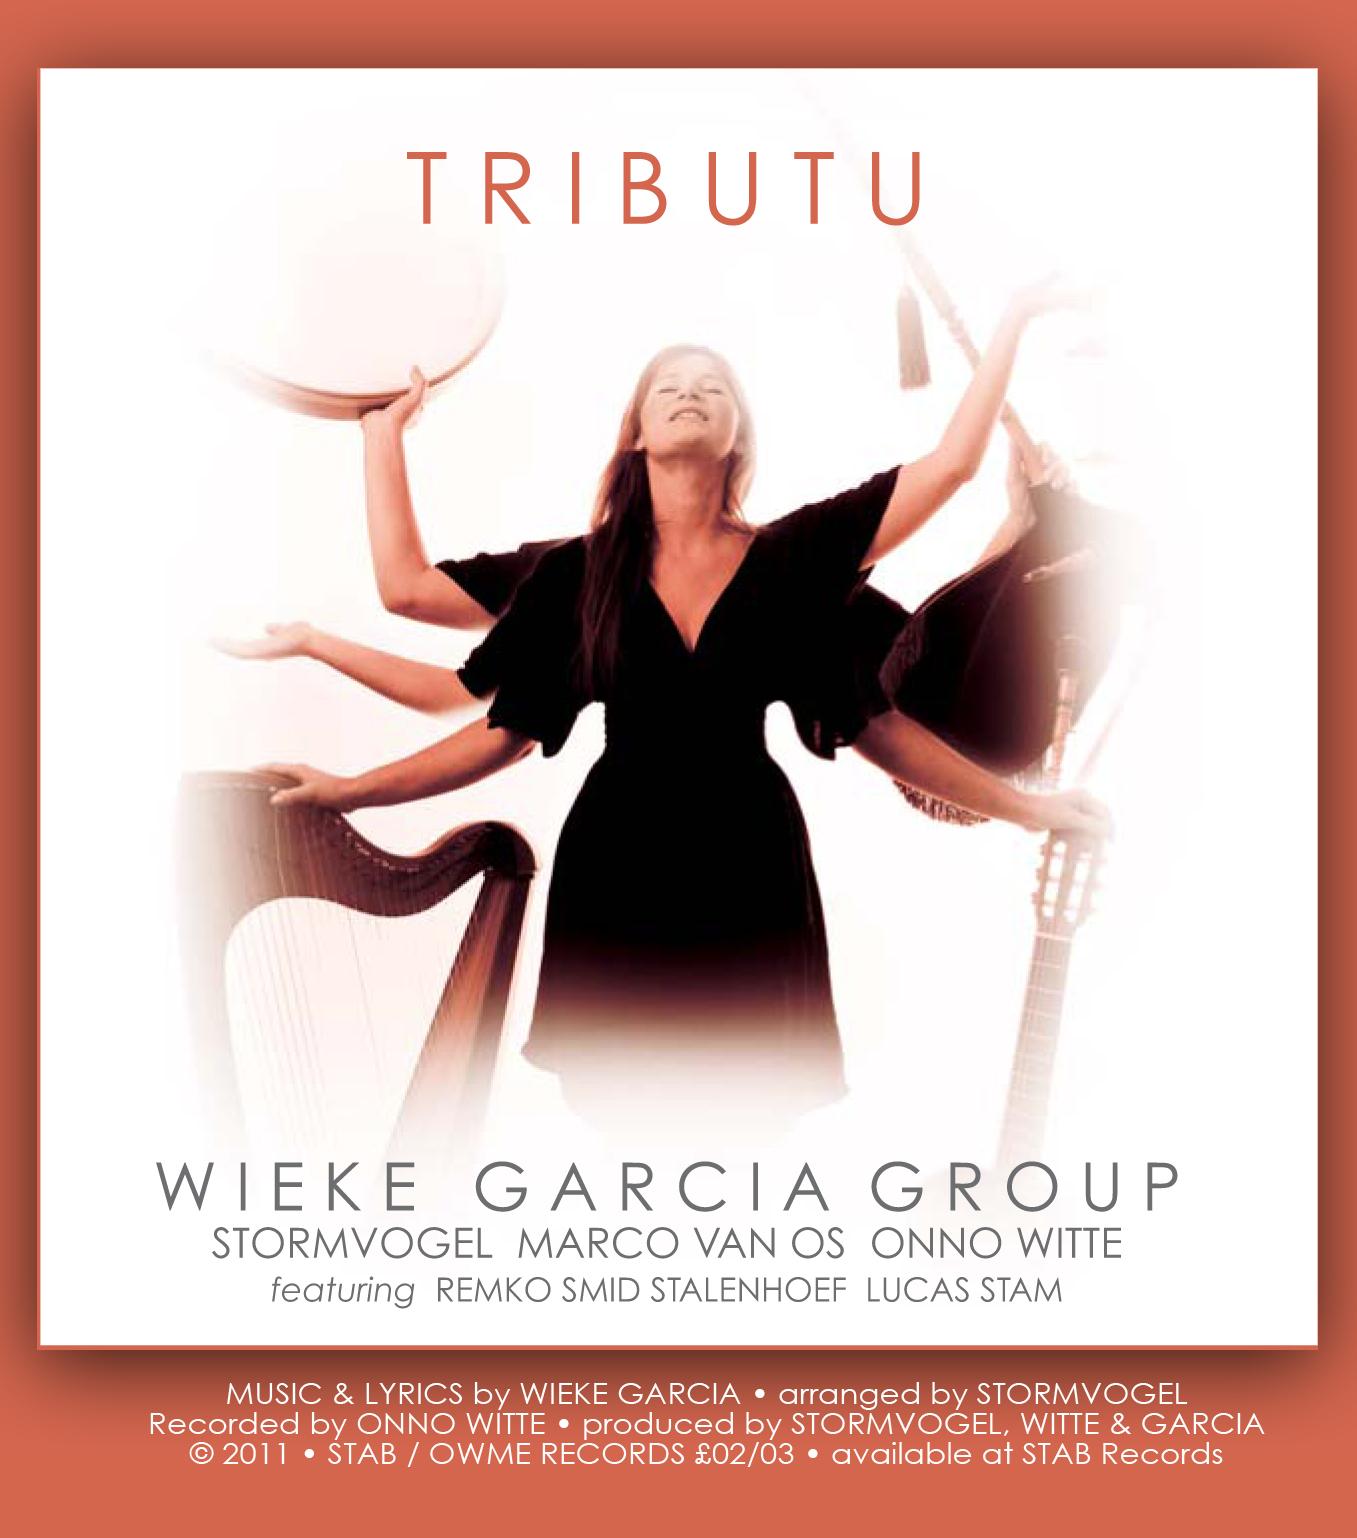 WIEKE GARCIA CD 'TRIBUTU' (2011) Stormvogel: music, production, design